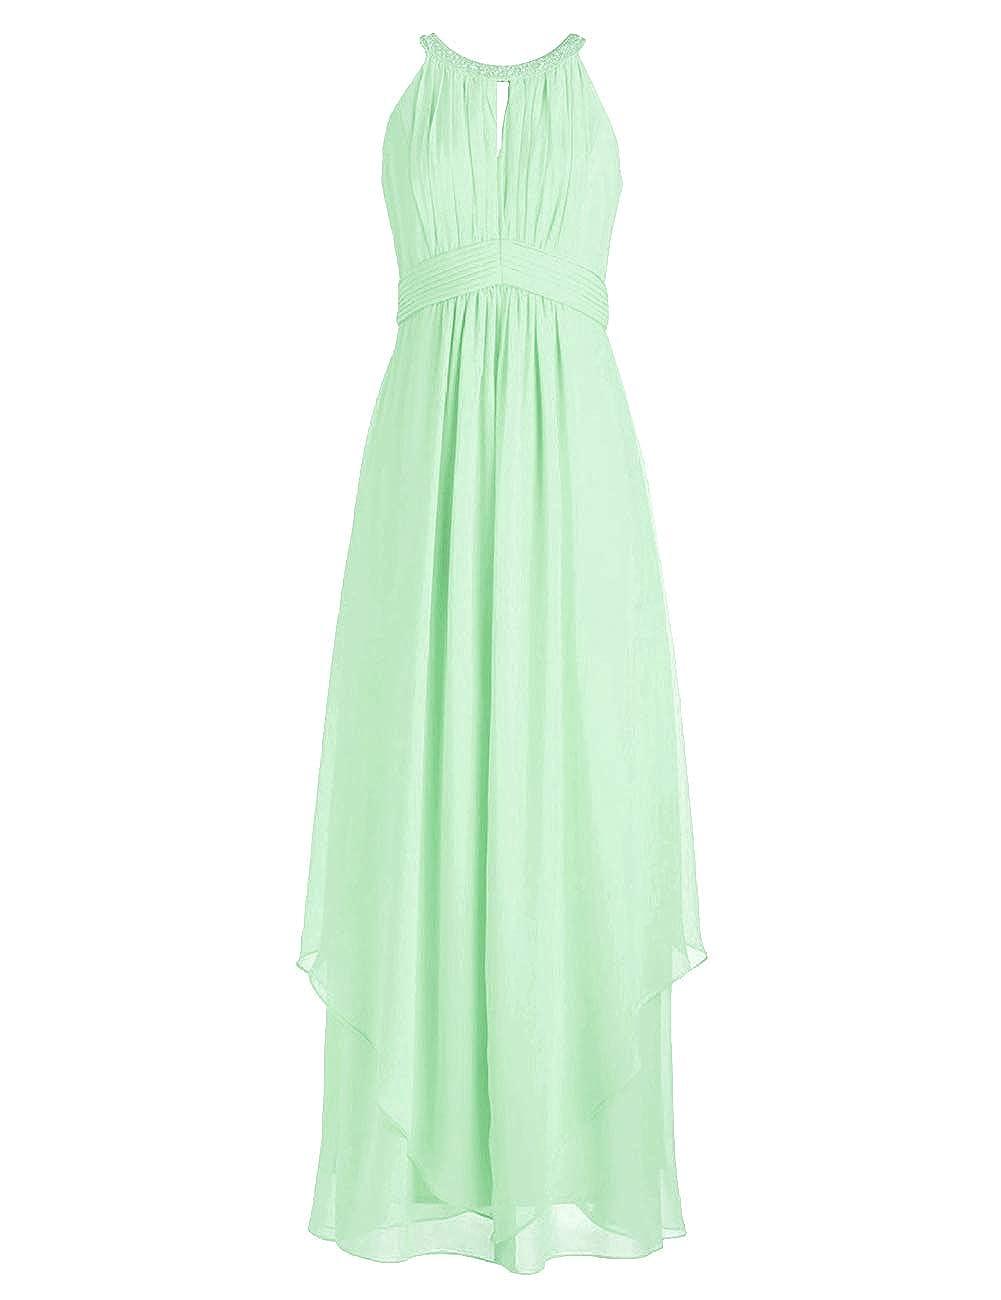 Mint Green Bridesmaid Dresses Halter Evening Party Dress Long Bridesmaid Gowns Ruffles